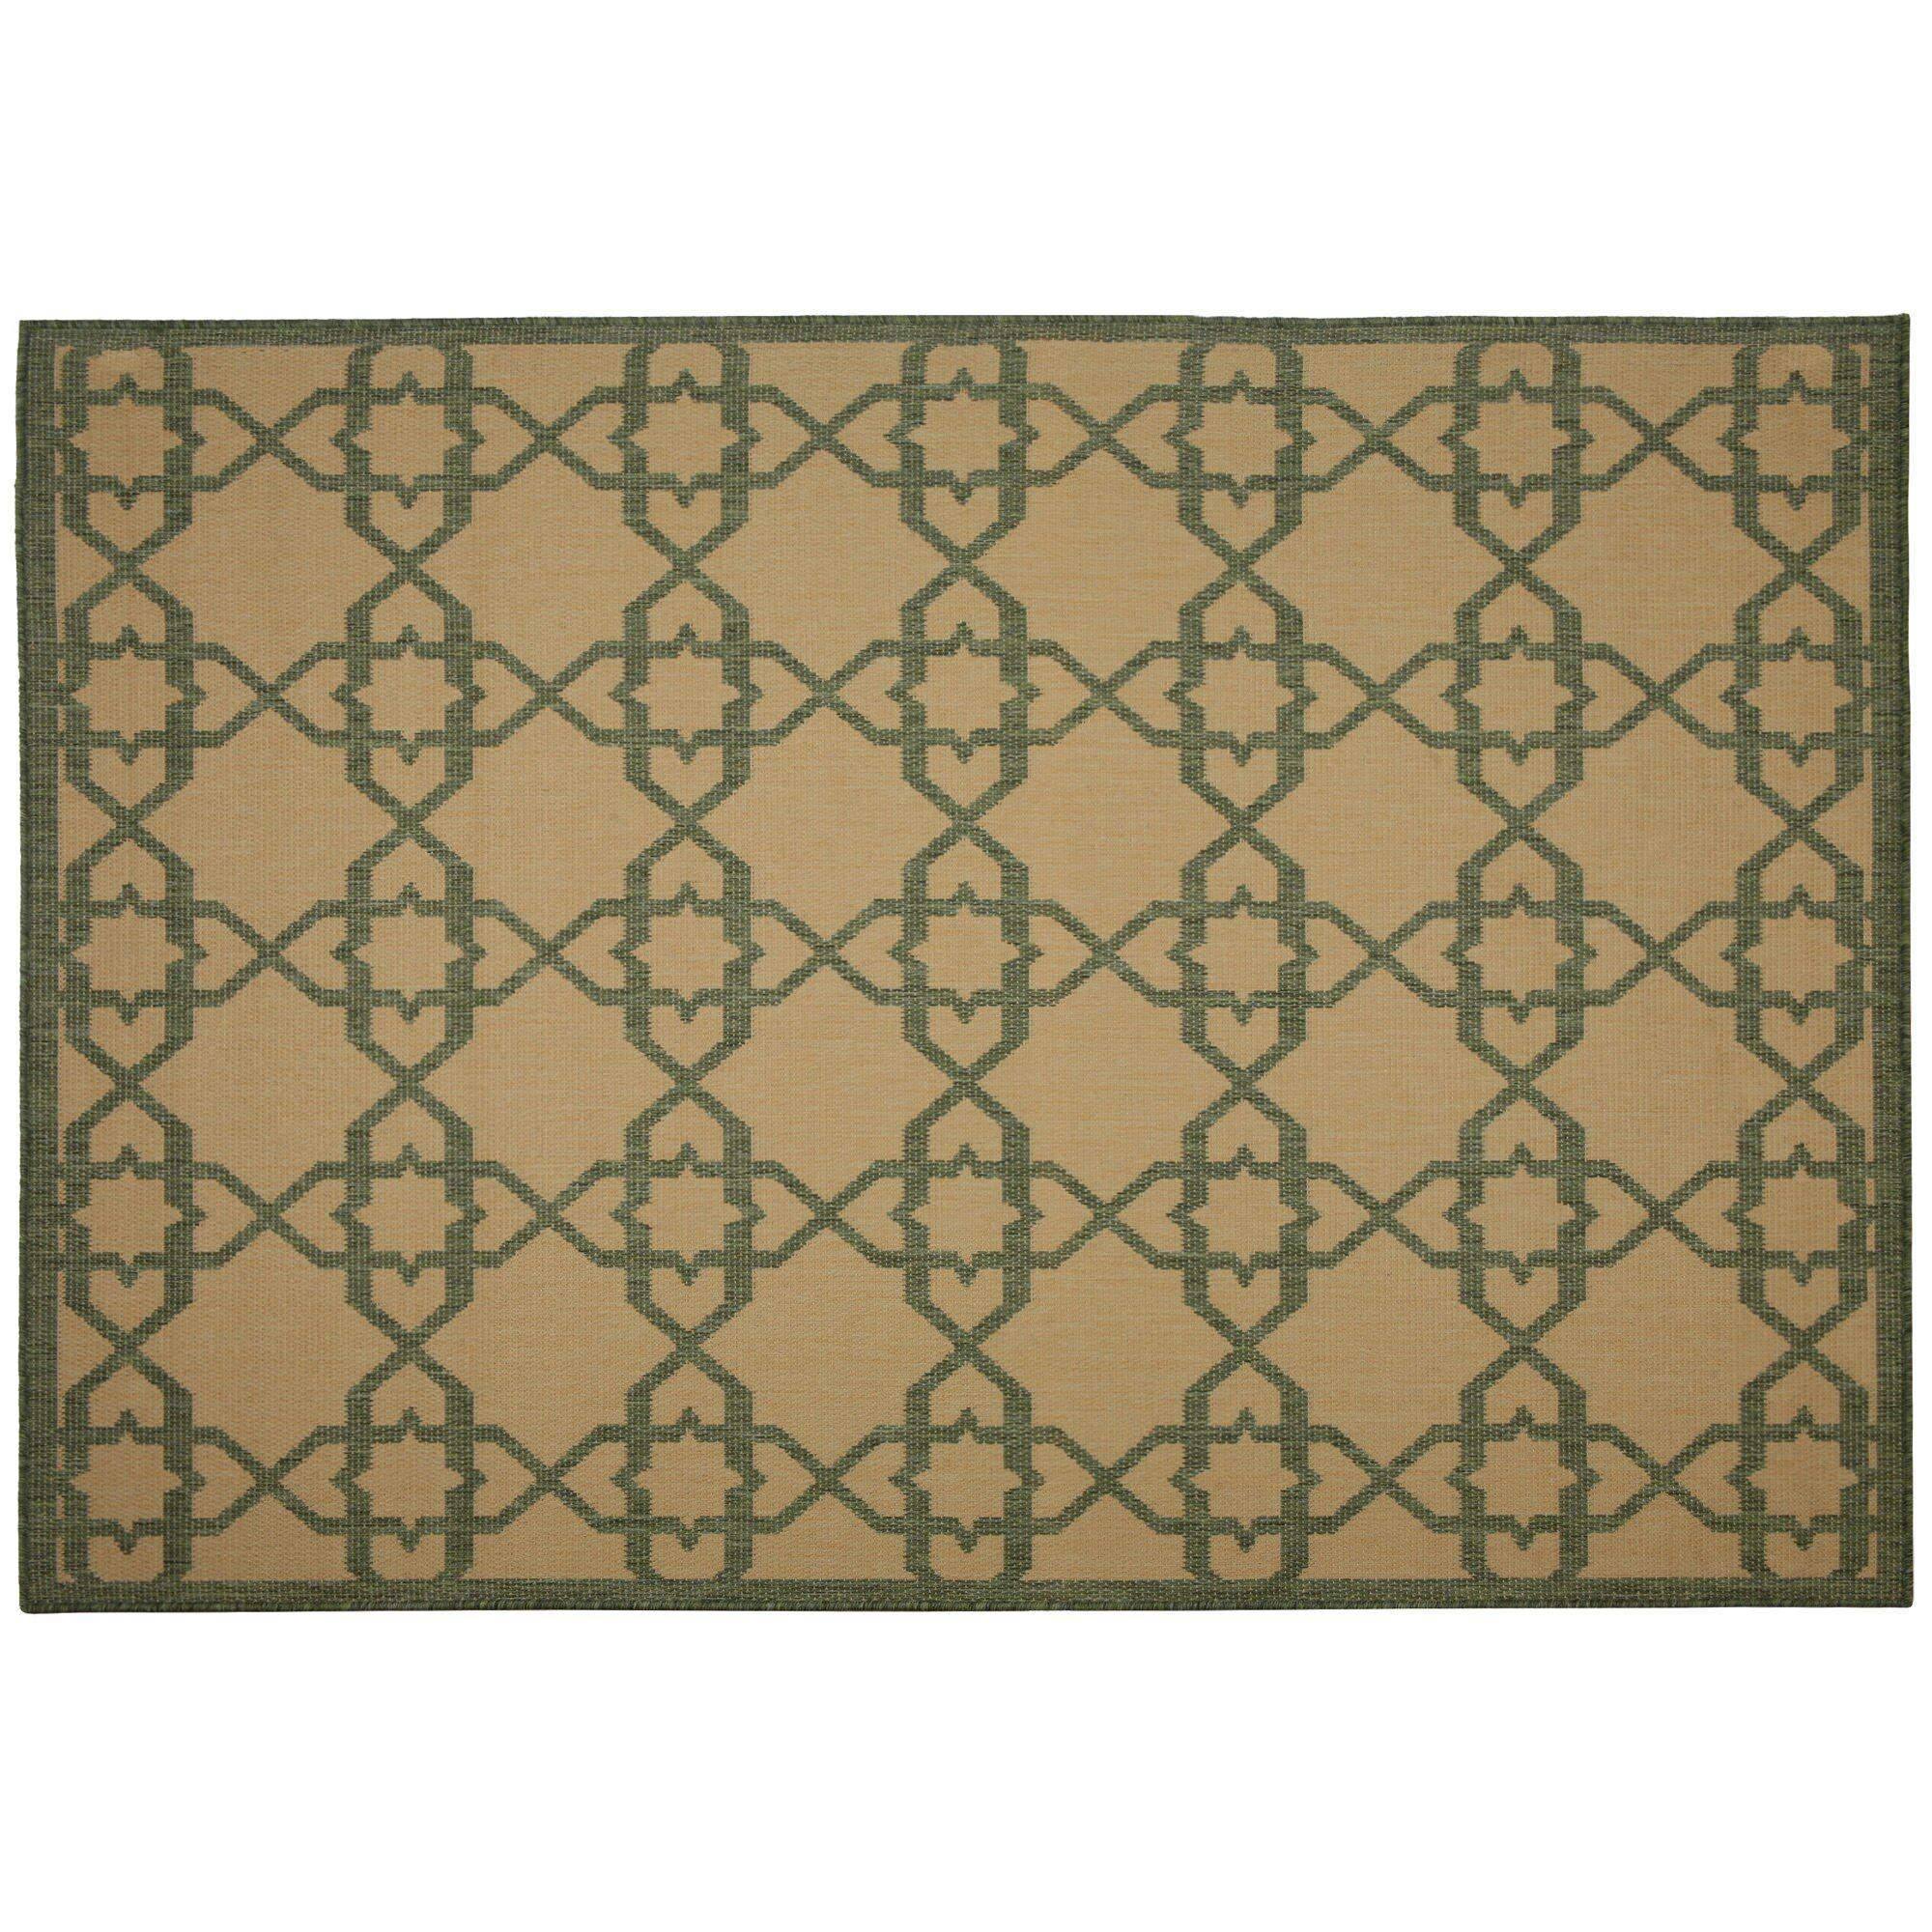 Eduardo Green Geometric Indoor/Outdoor Area Rug Rug Size: Rectangle 2' x 3'